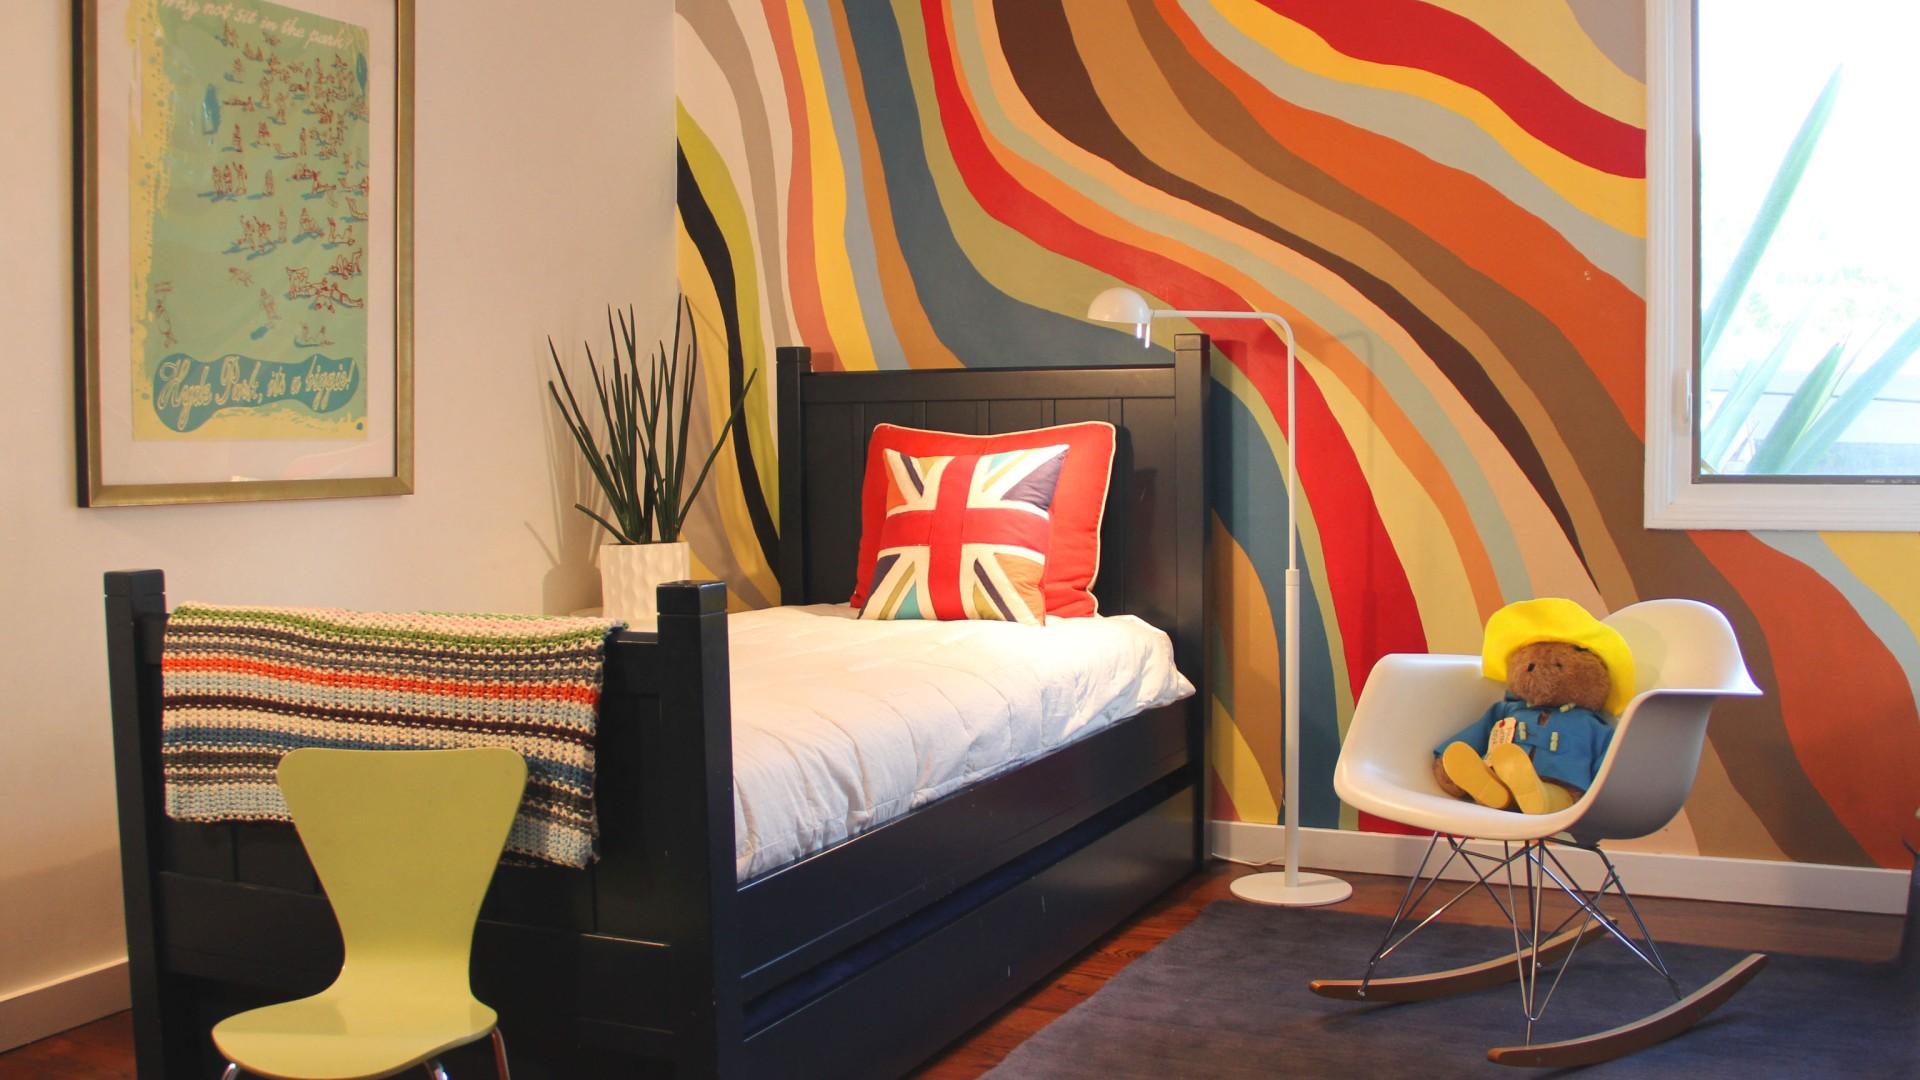 креативные идеи декора стен обоями